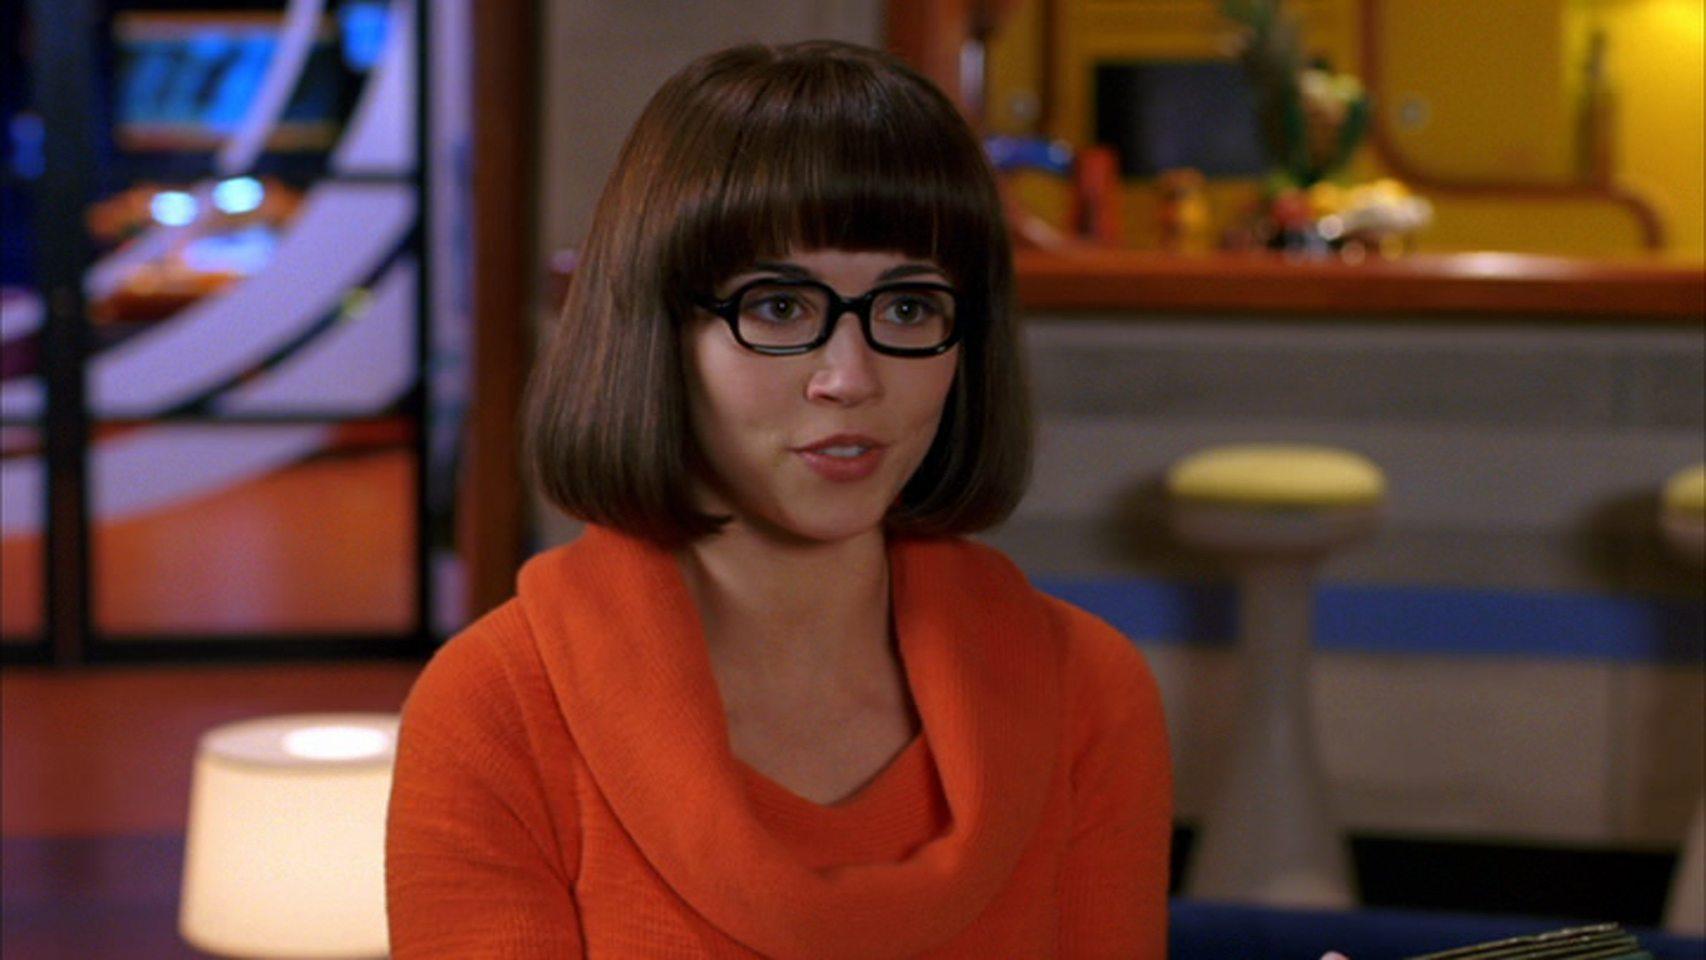 23 fotos de chicas visten para arriba como Velma De Scooby Doo-7833